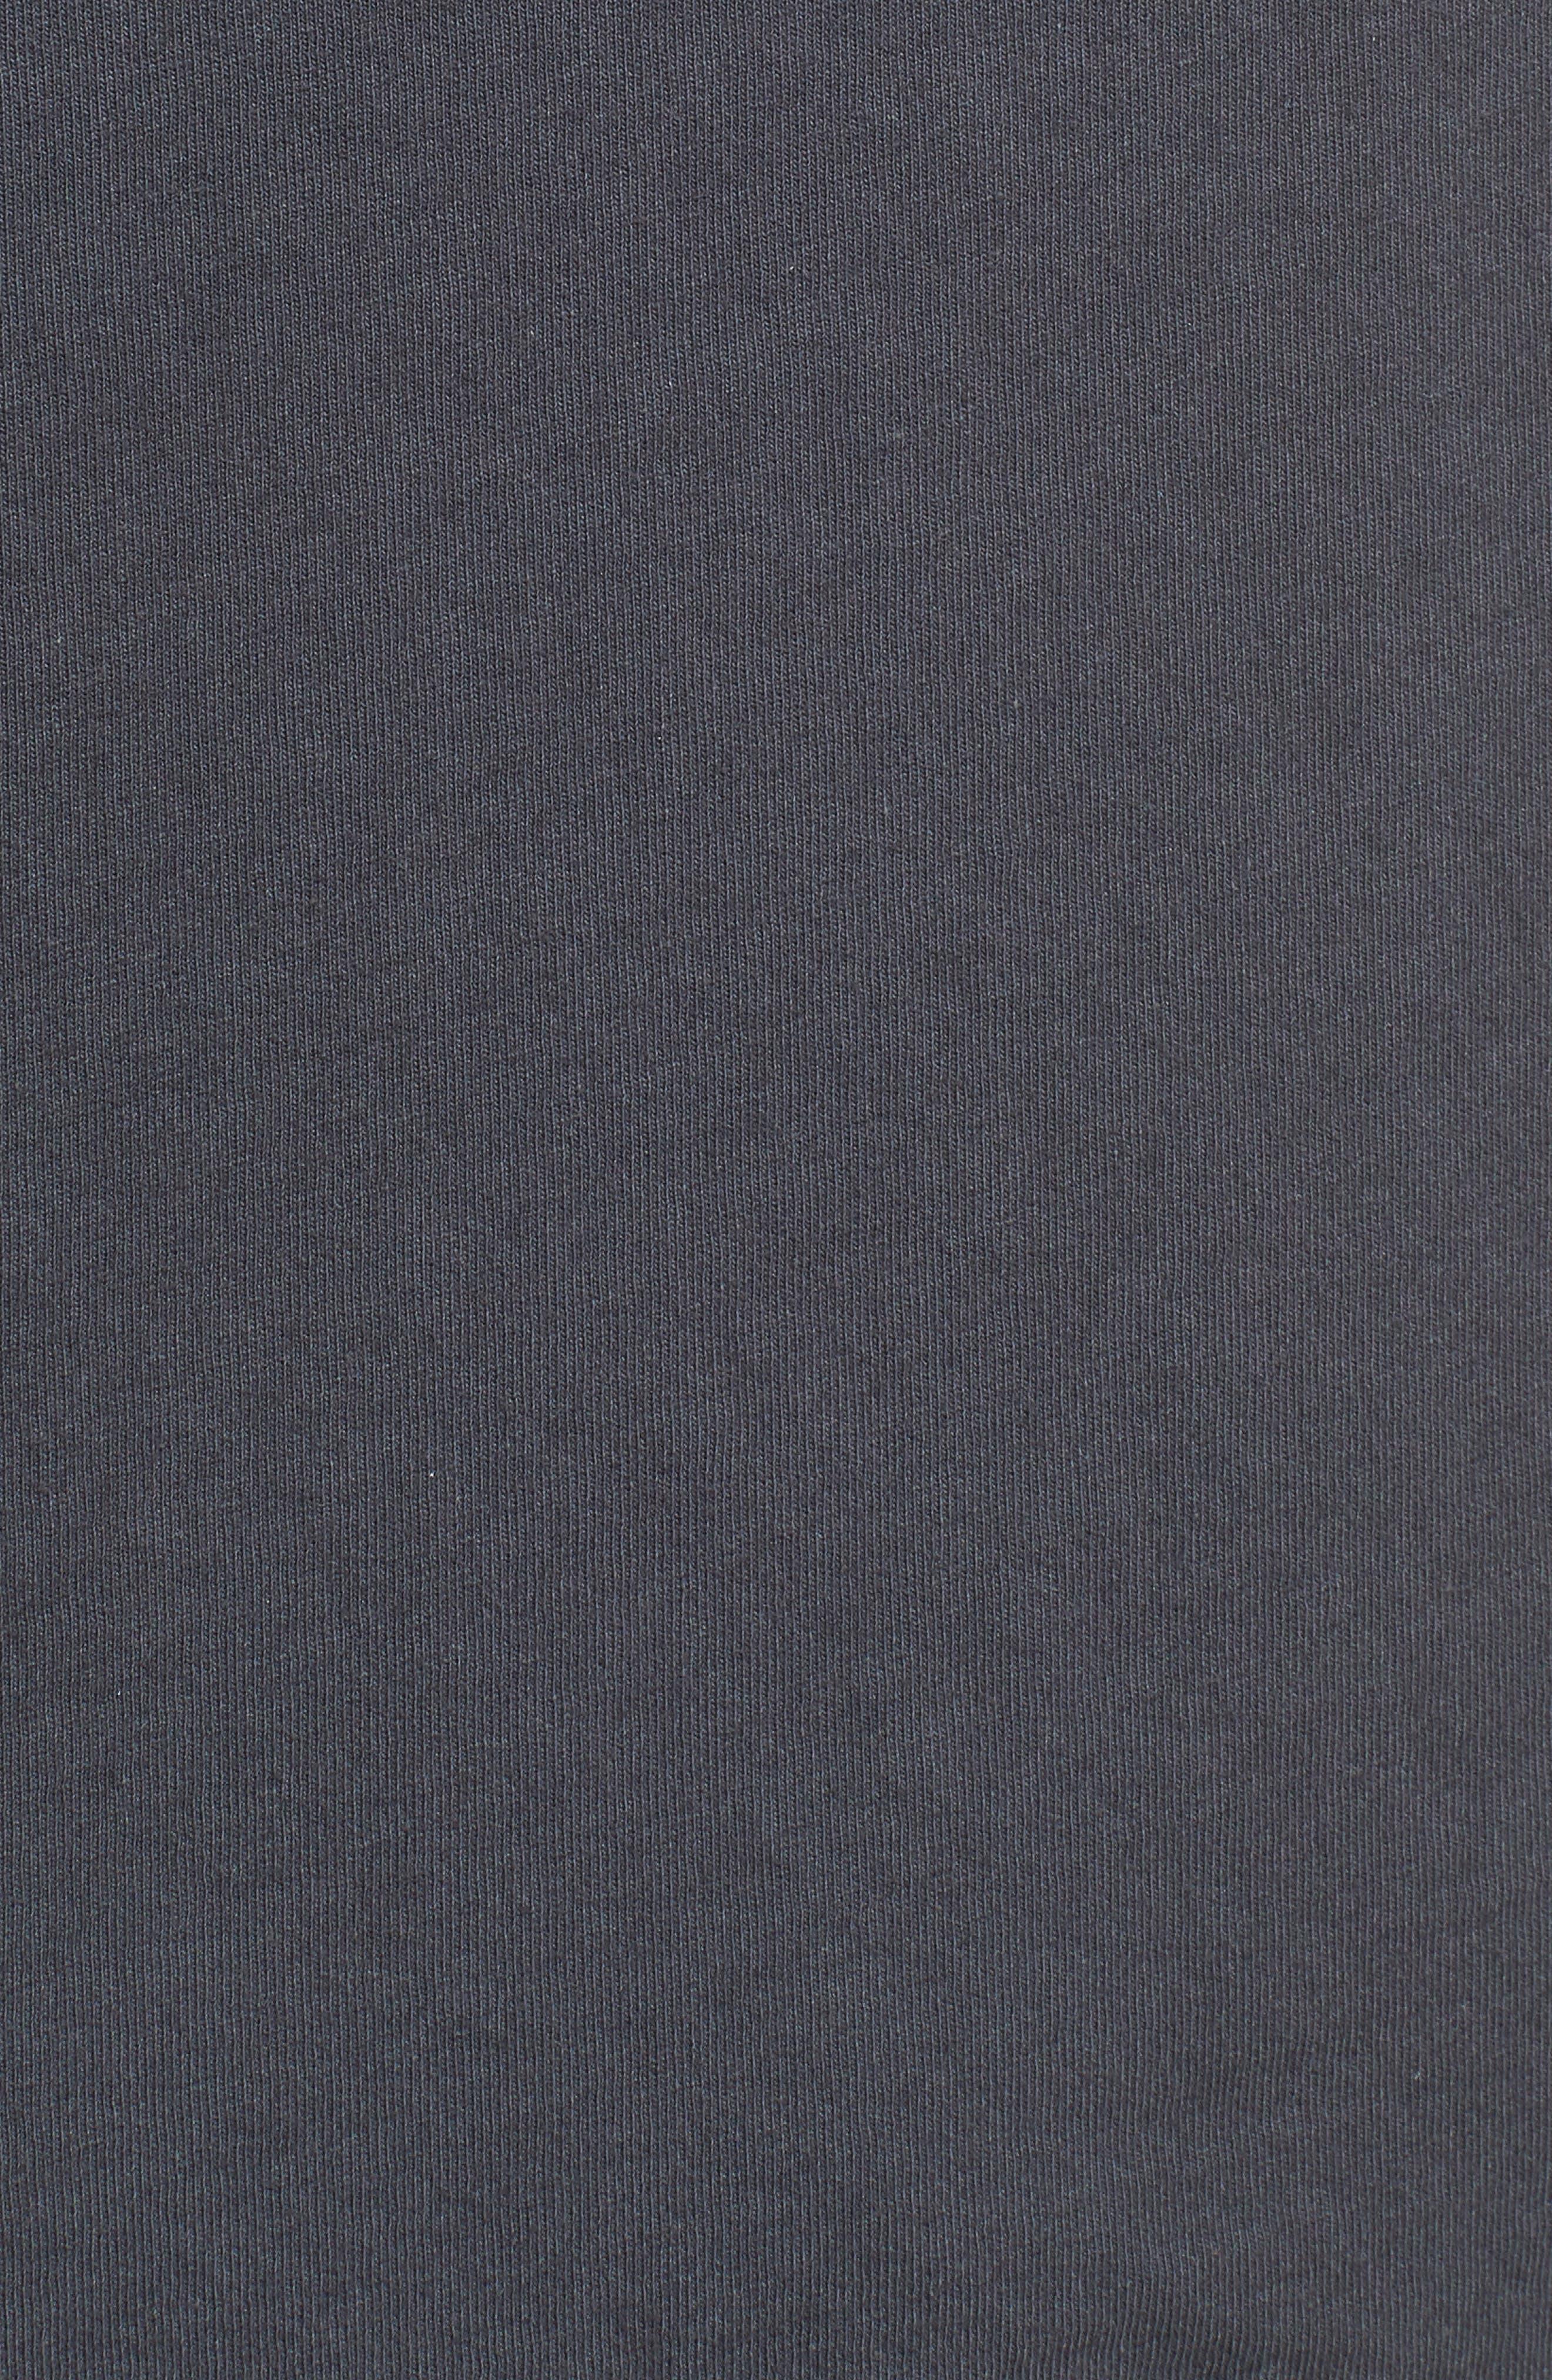 Joe Cool Checkerboard Tee,                             Alternate thumbnail 5, color,                             BLACK